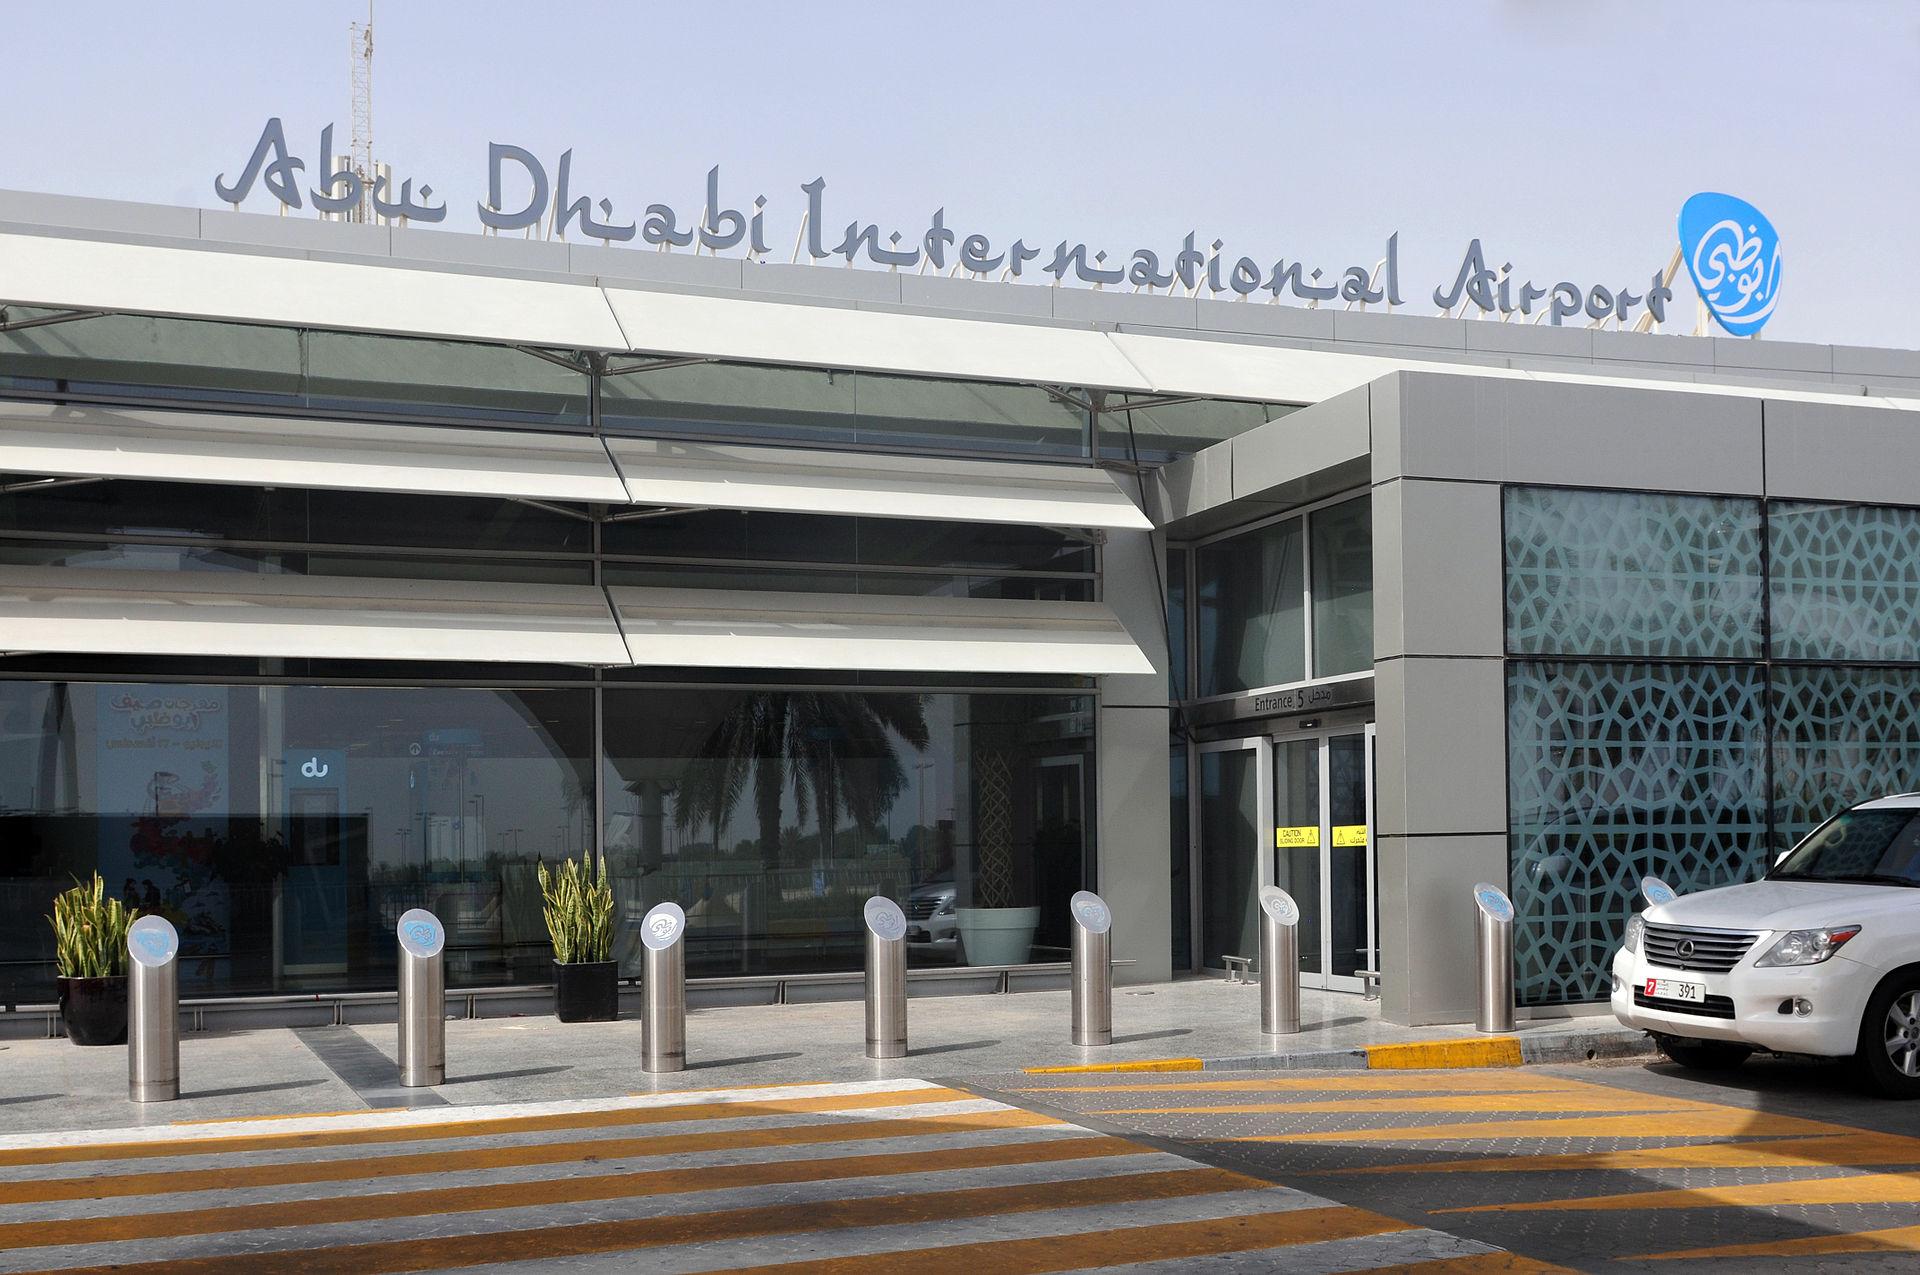 Aeroporto internazionale di abu dhabi wikipedia for International decor company abu dhabi